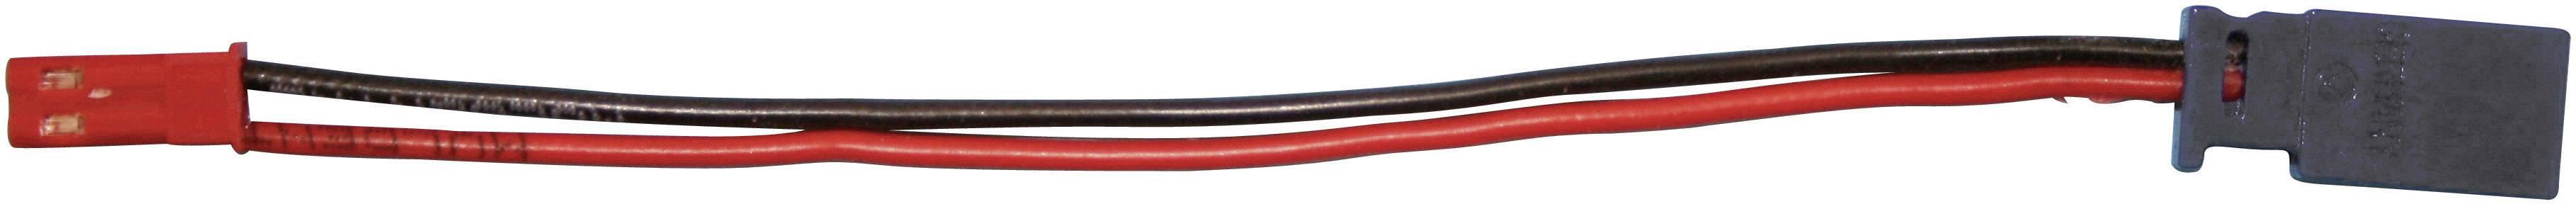 Redukce BEC zásuvka / Futaba zástrčka Modelcraft, 100 mm, 0,5 mm²